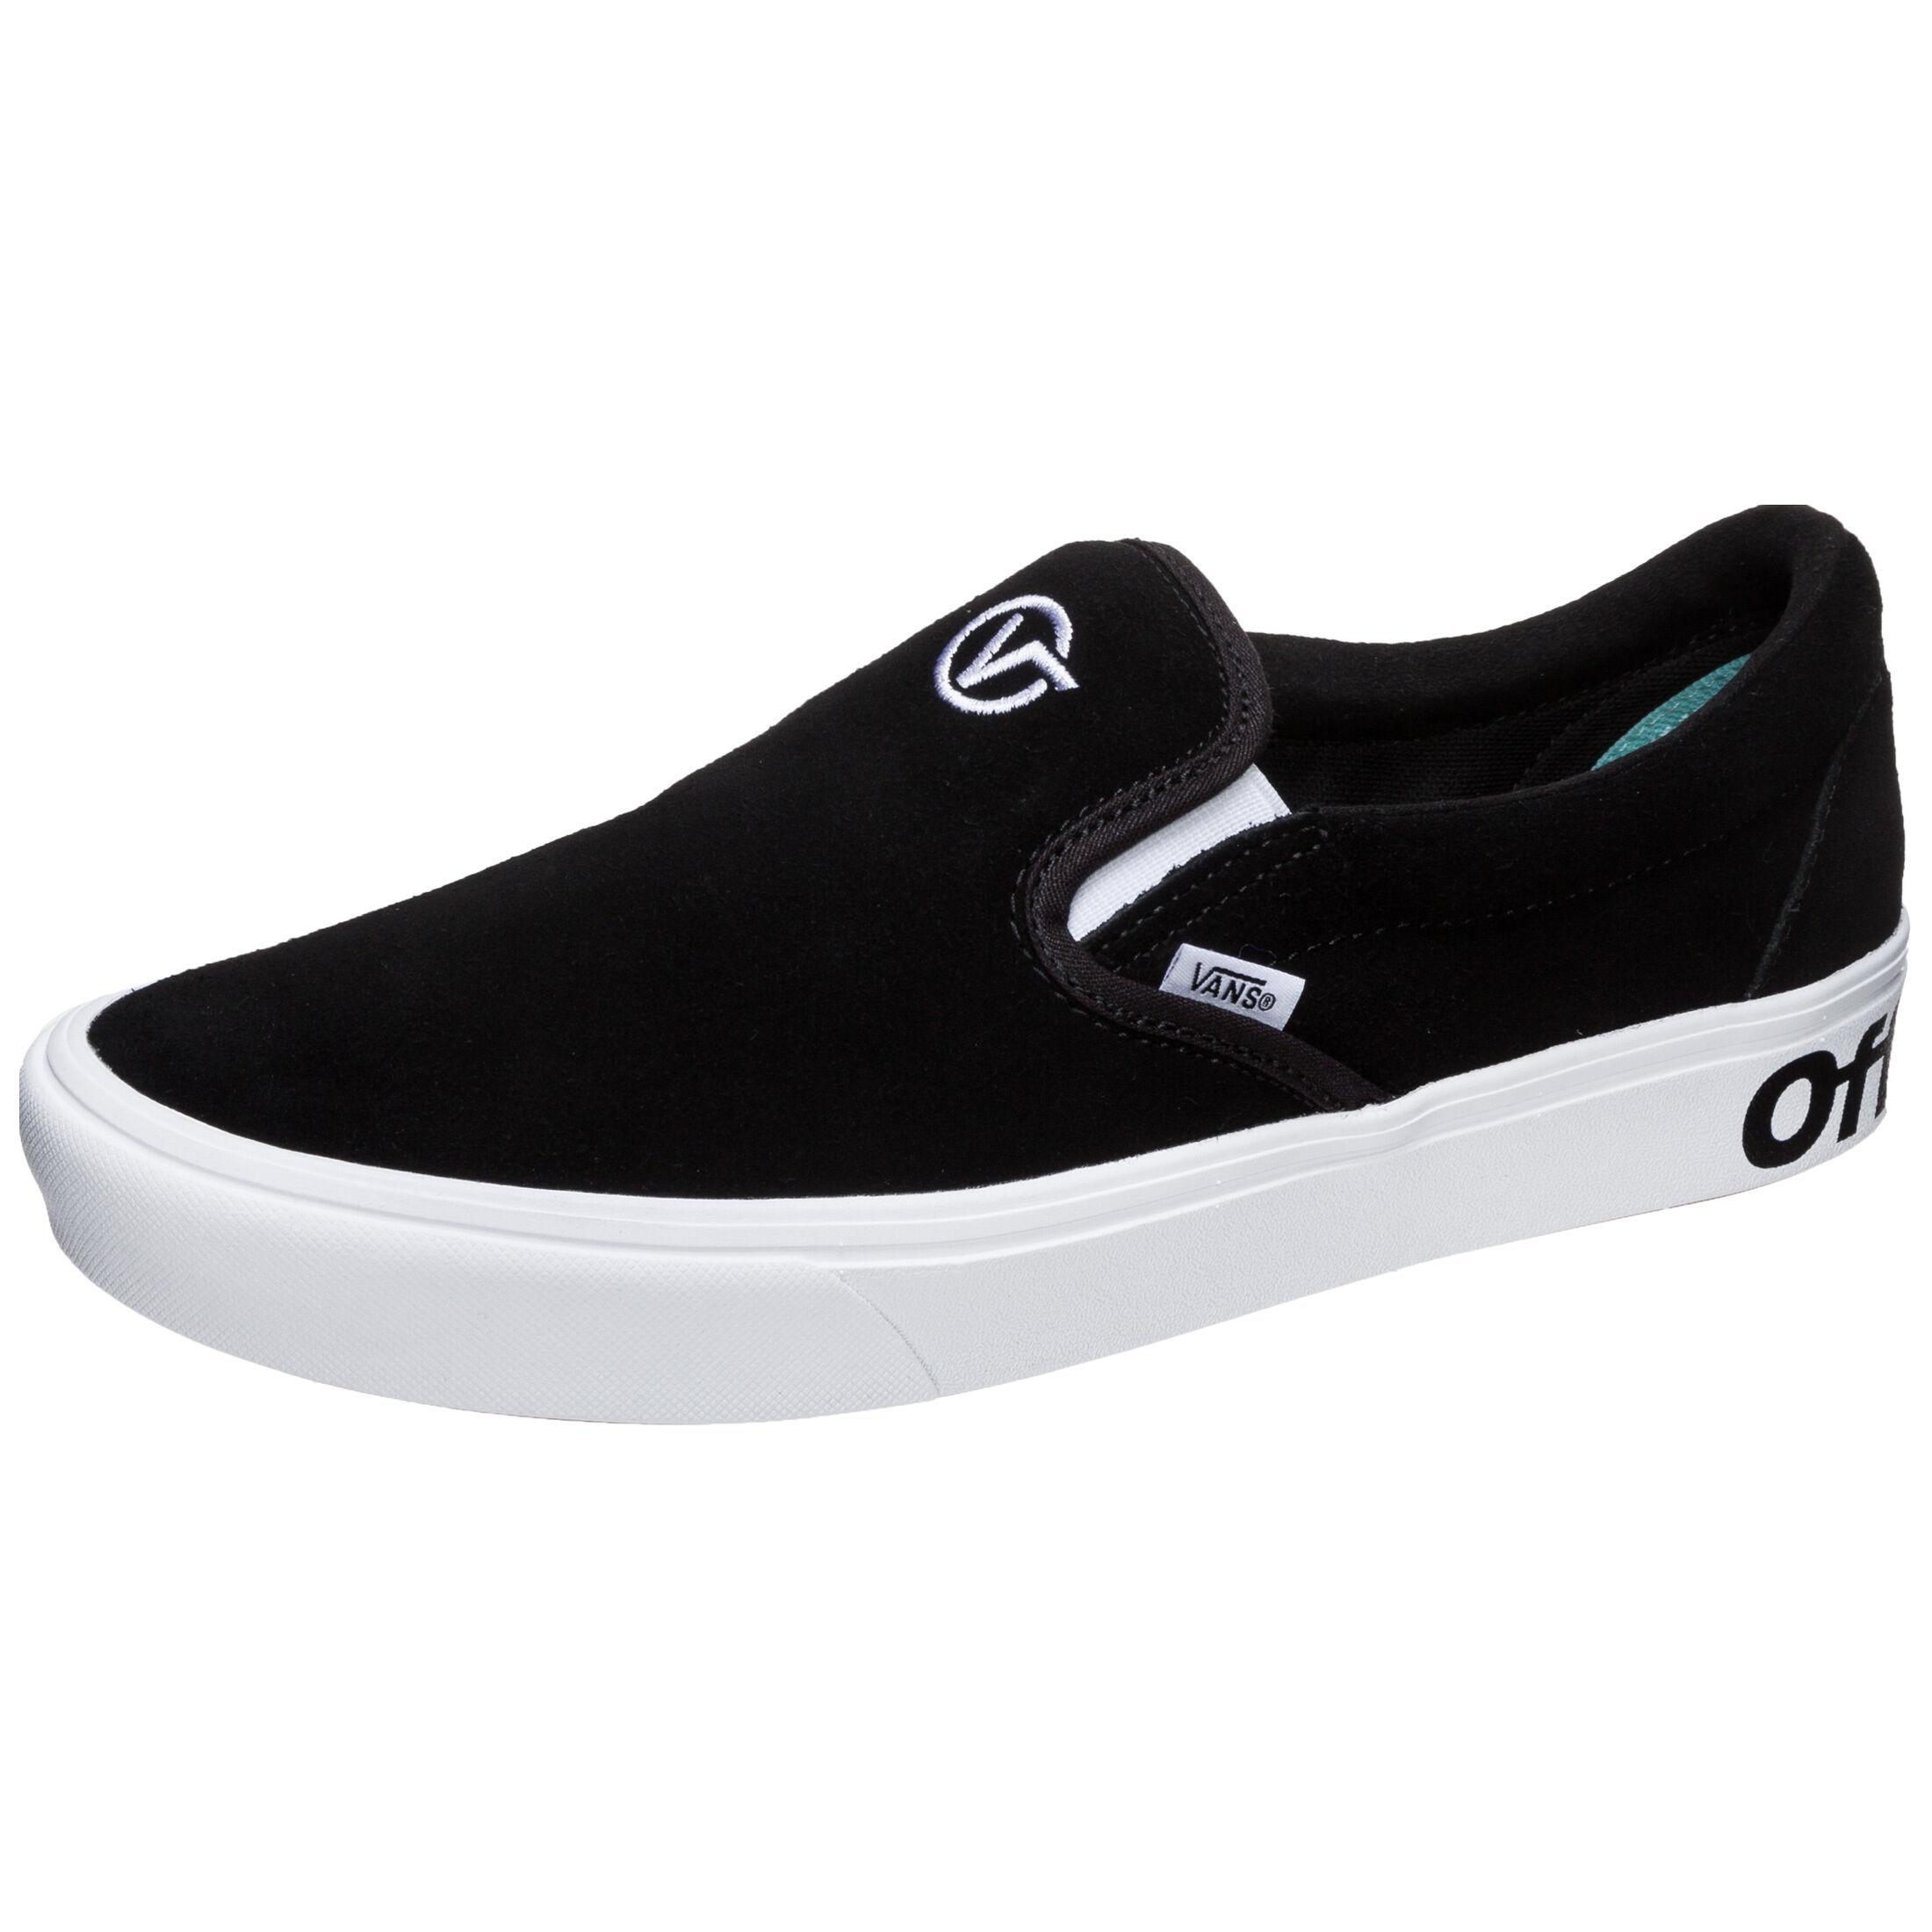 Günstige Sneaker Shop Vans im OUTFITTER SALE